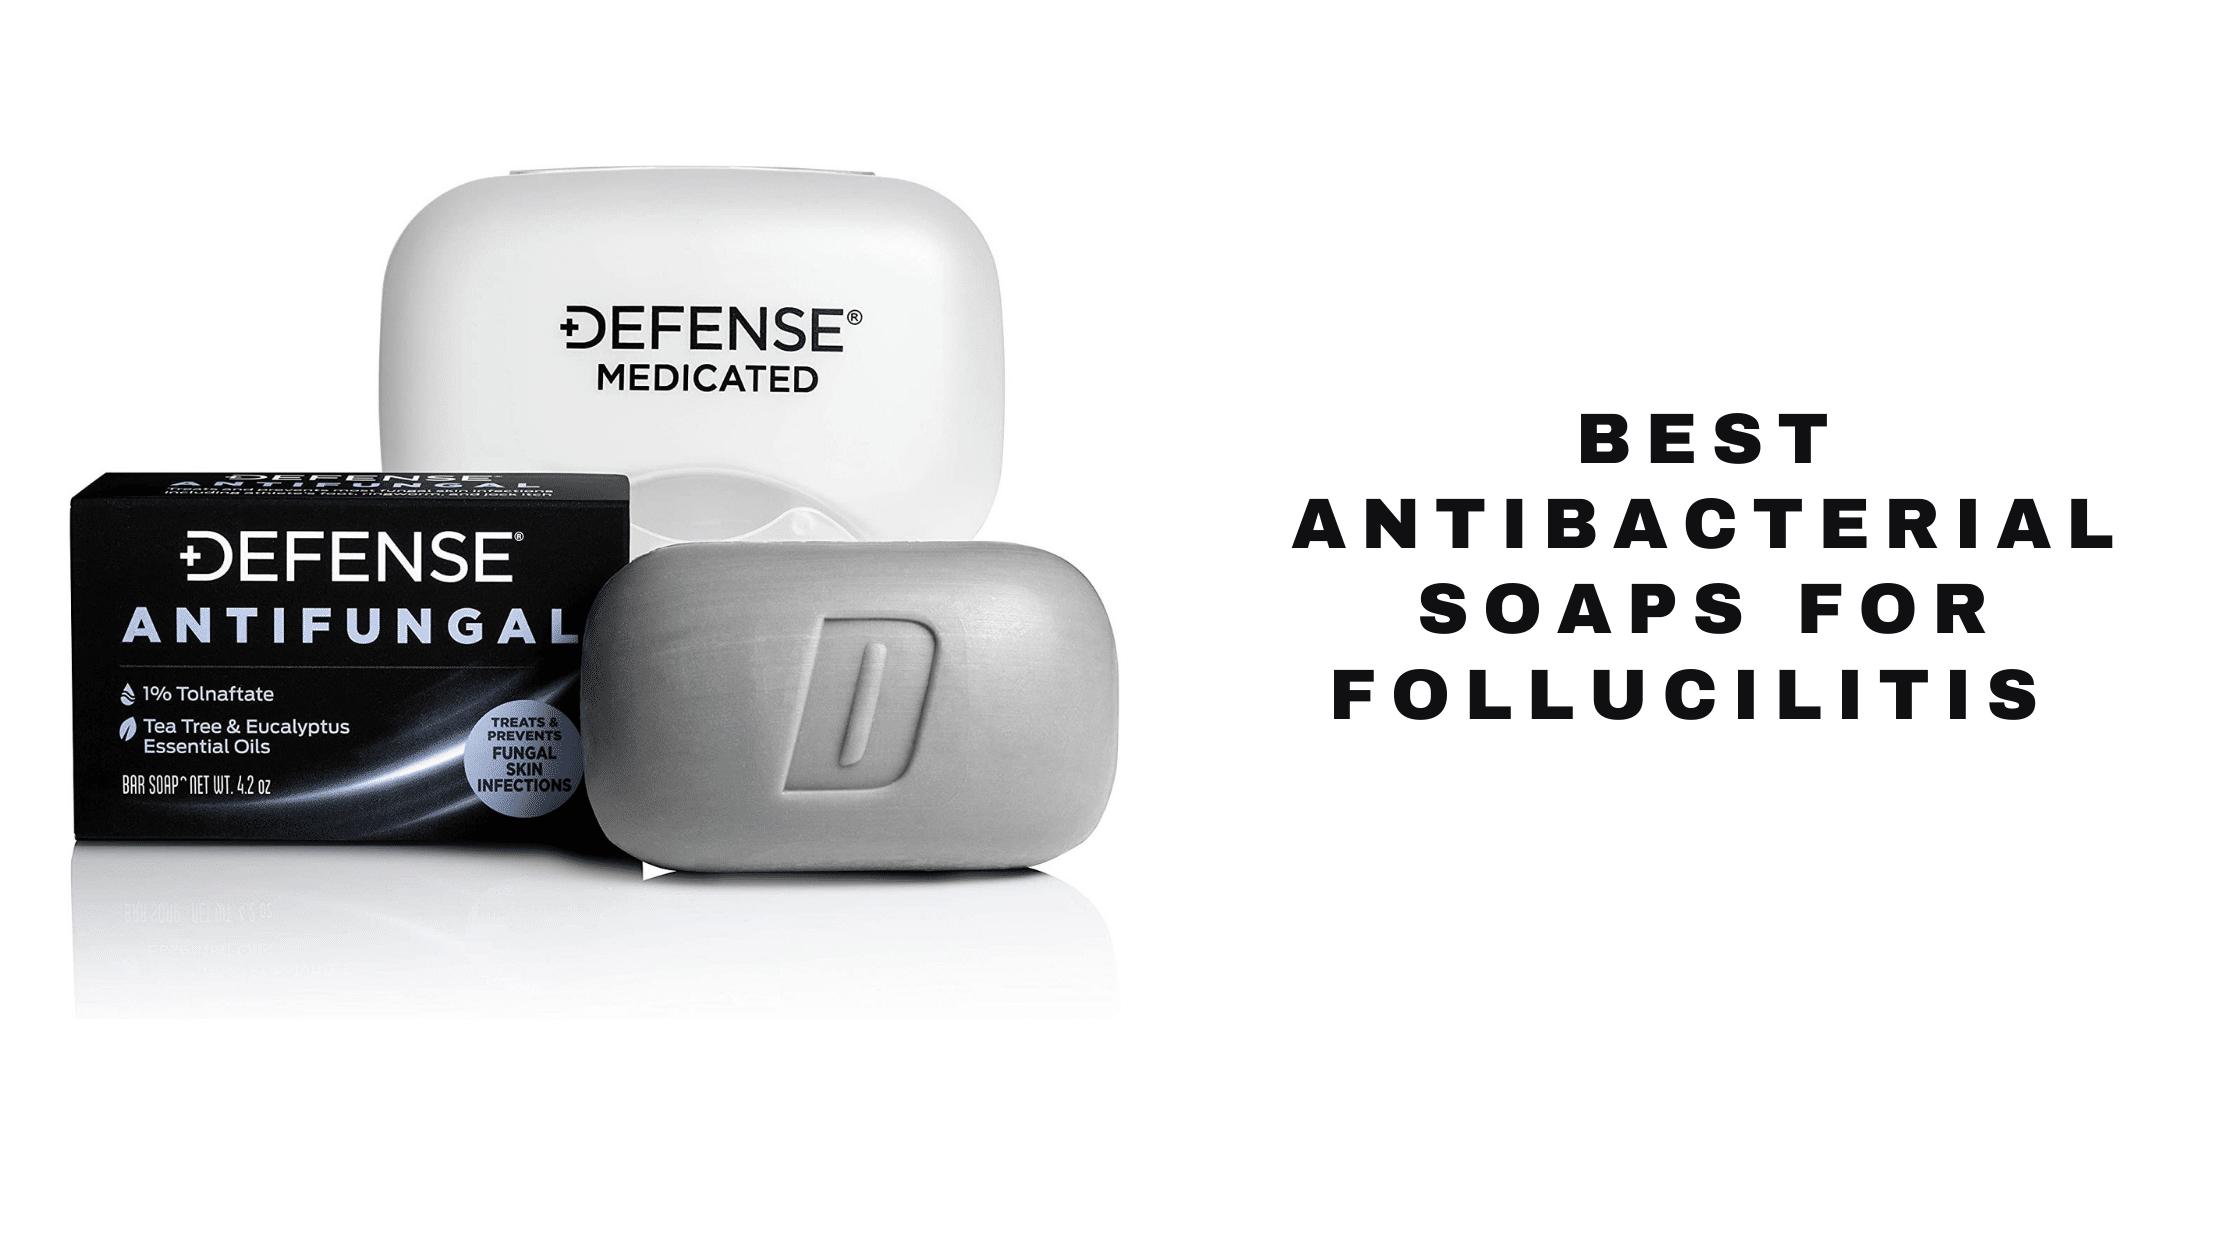 Best Antibacterial Soap for Folliculitis 2021